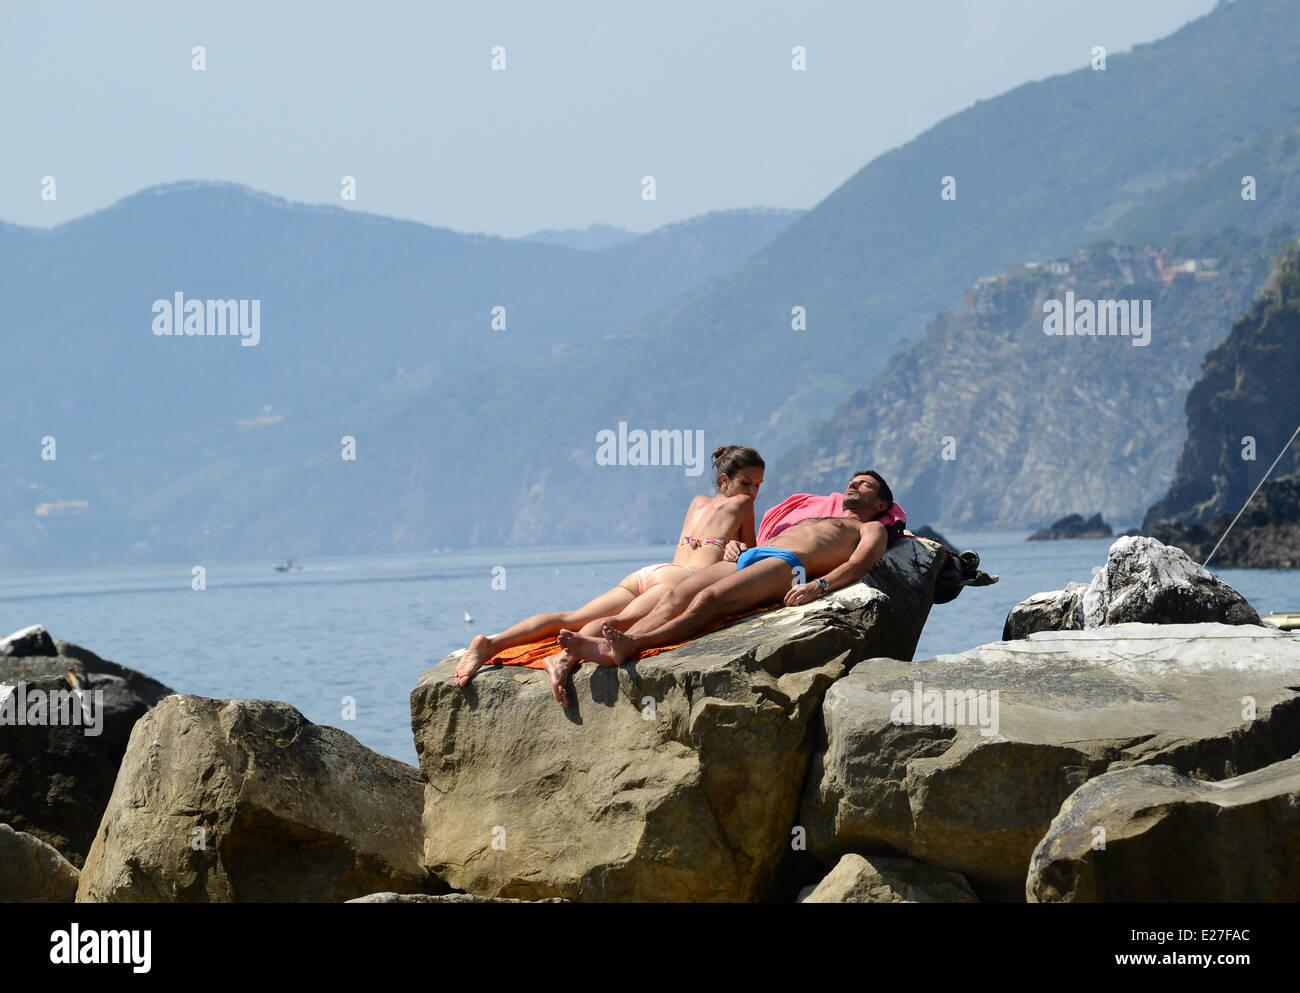 Sunbathing couples Nude Photos 33